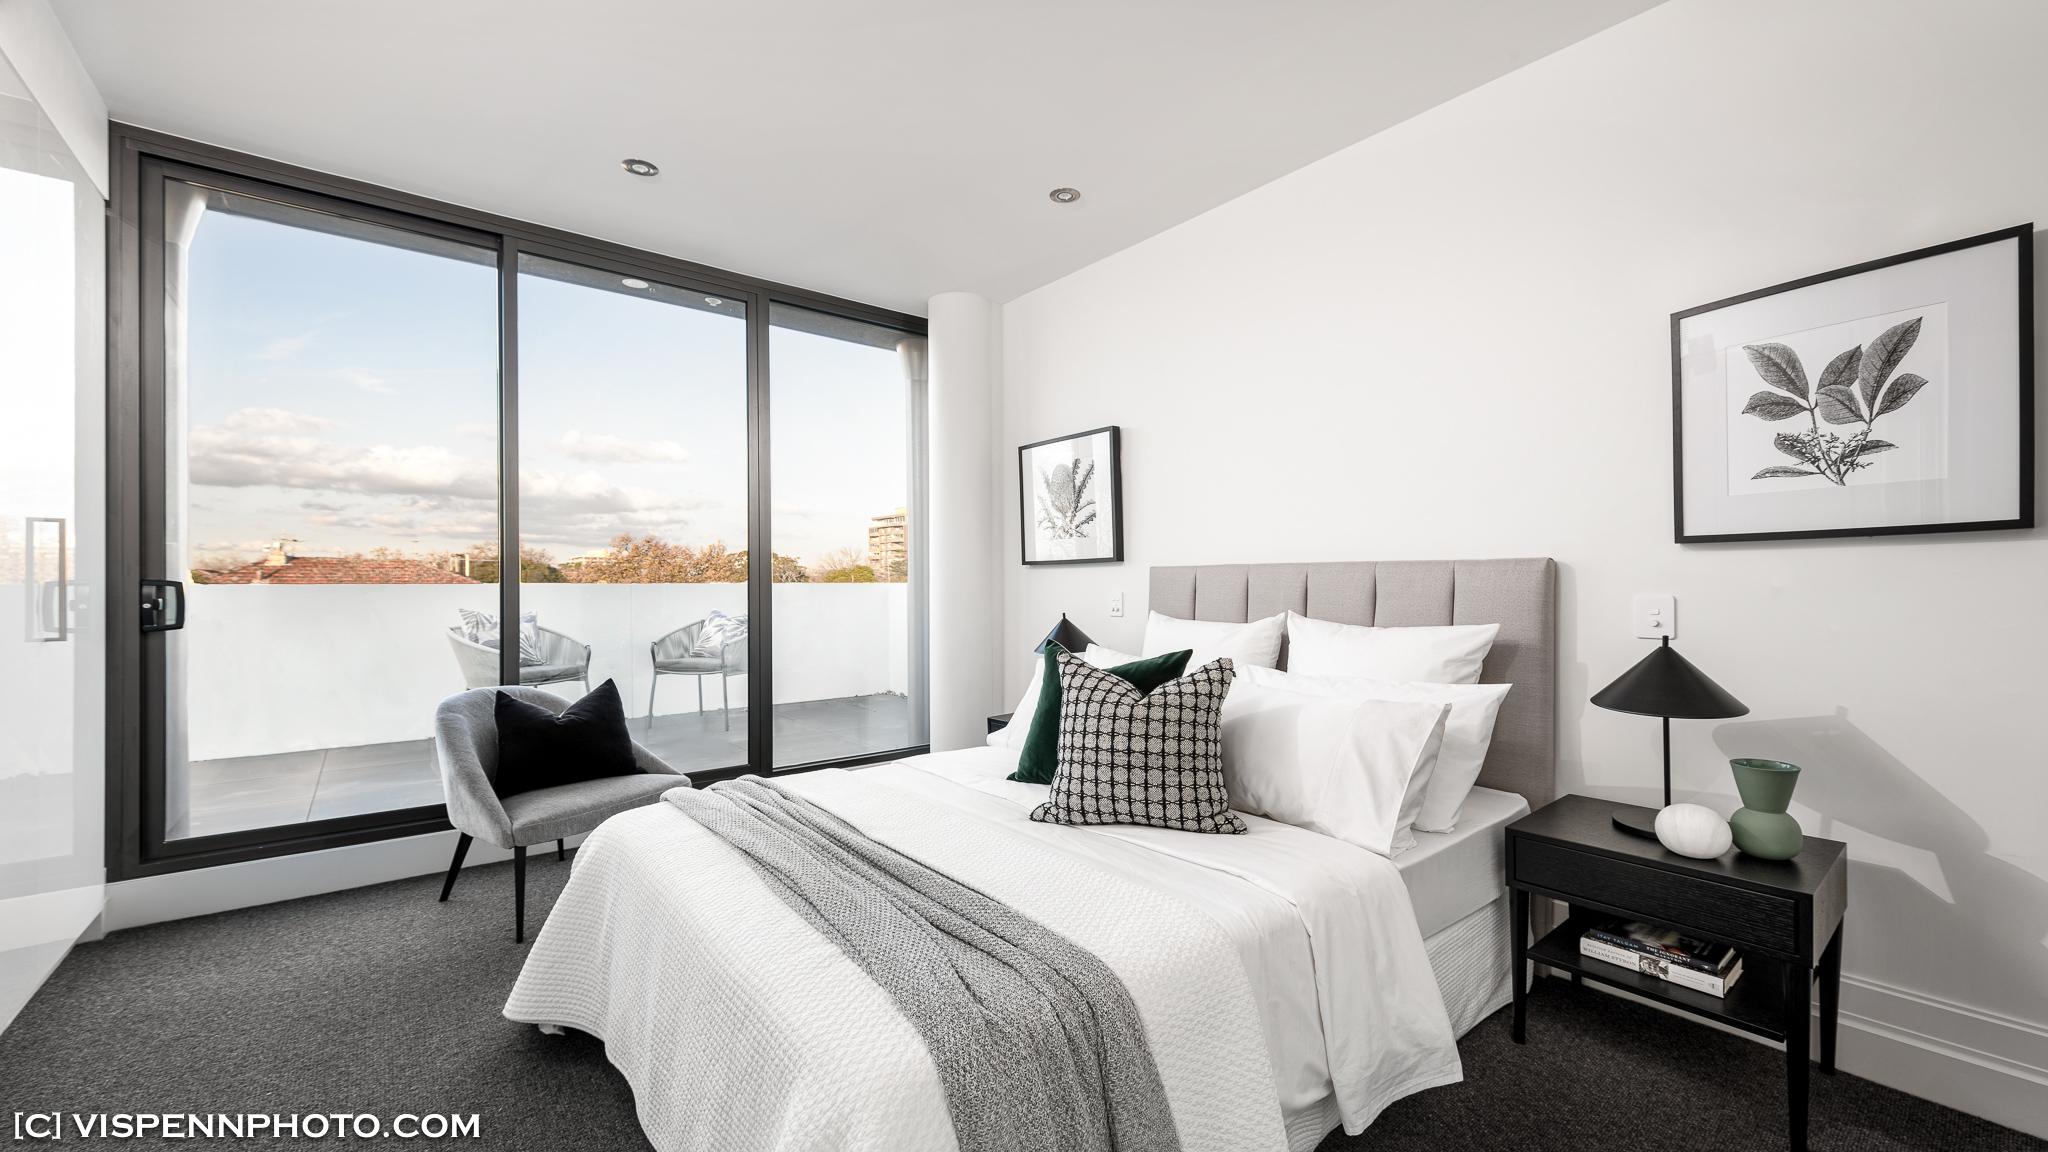 REAL ESTATE INTERIOR Photography Melbourne VISPENN 墨尔本 地产摄影 公寓拍摄 豪宅拍摄 VR远程看房 房产航拍 HAR00040 Edit